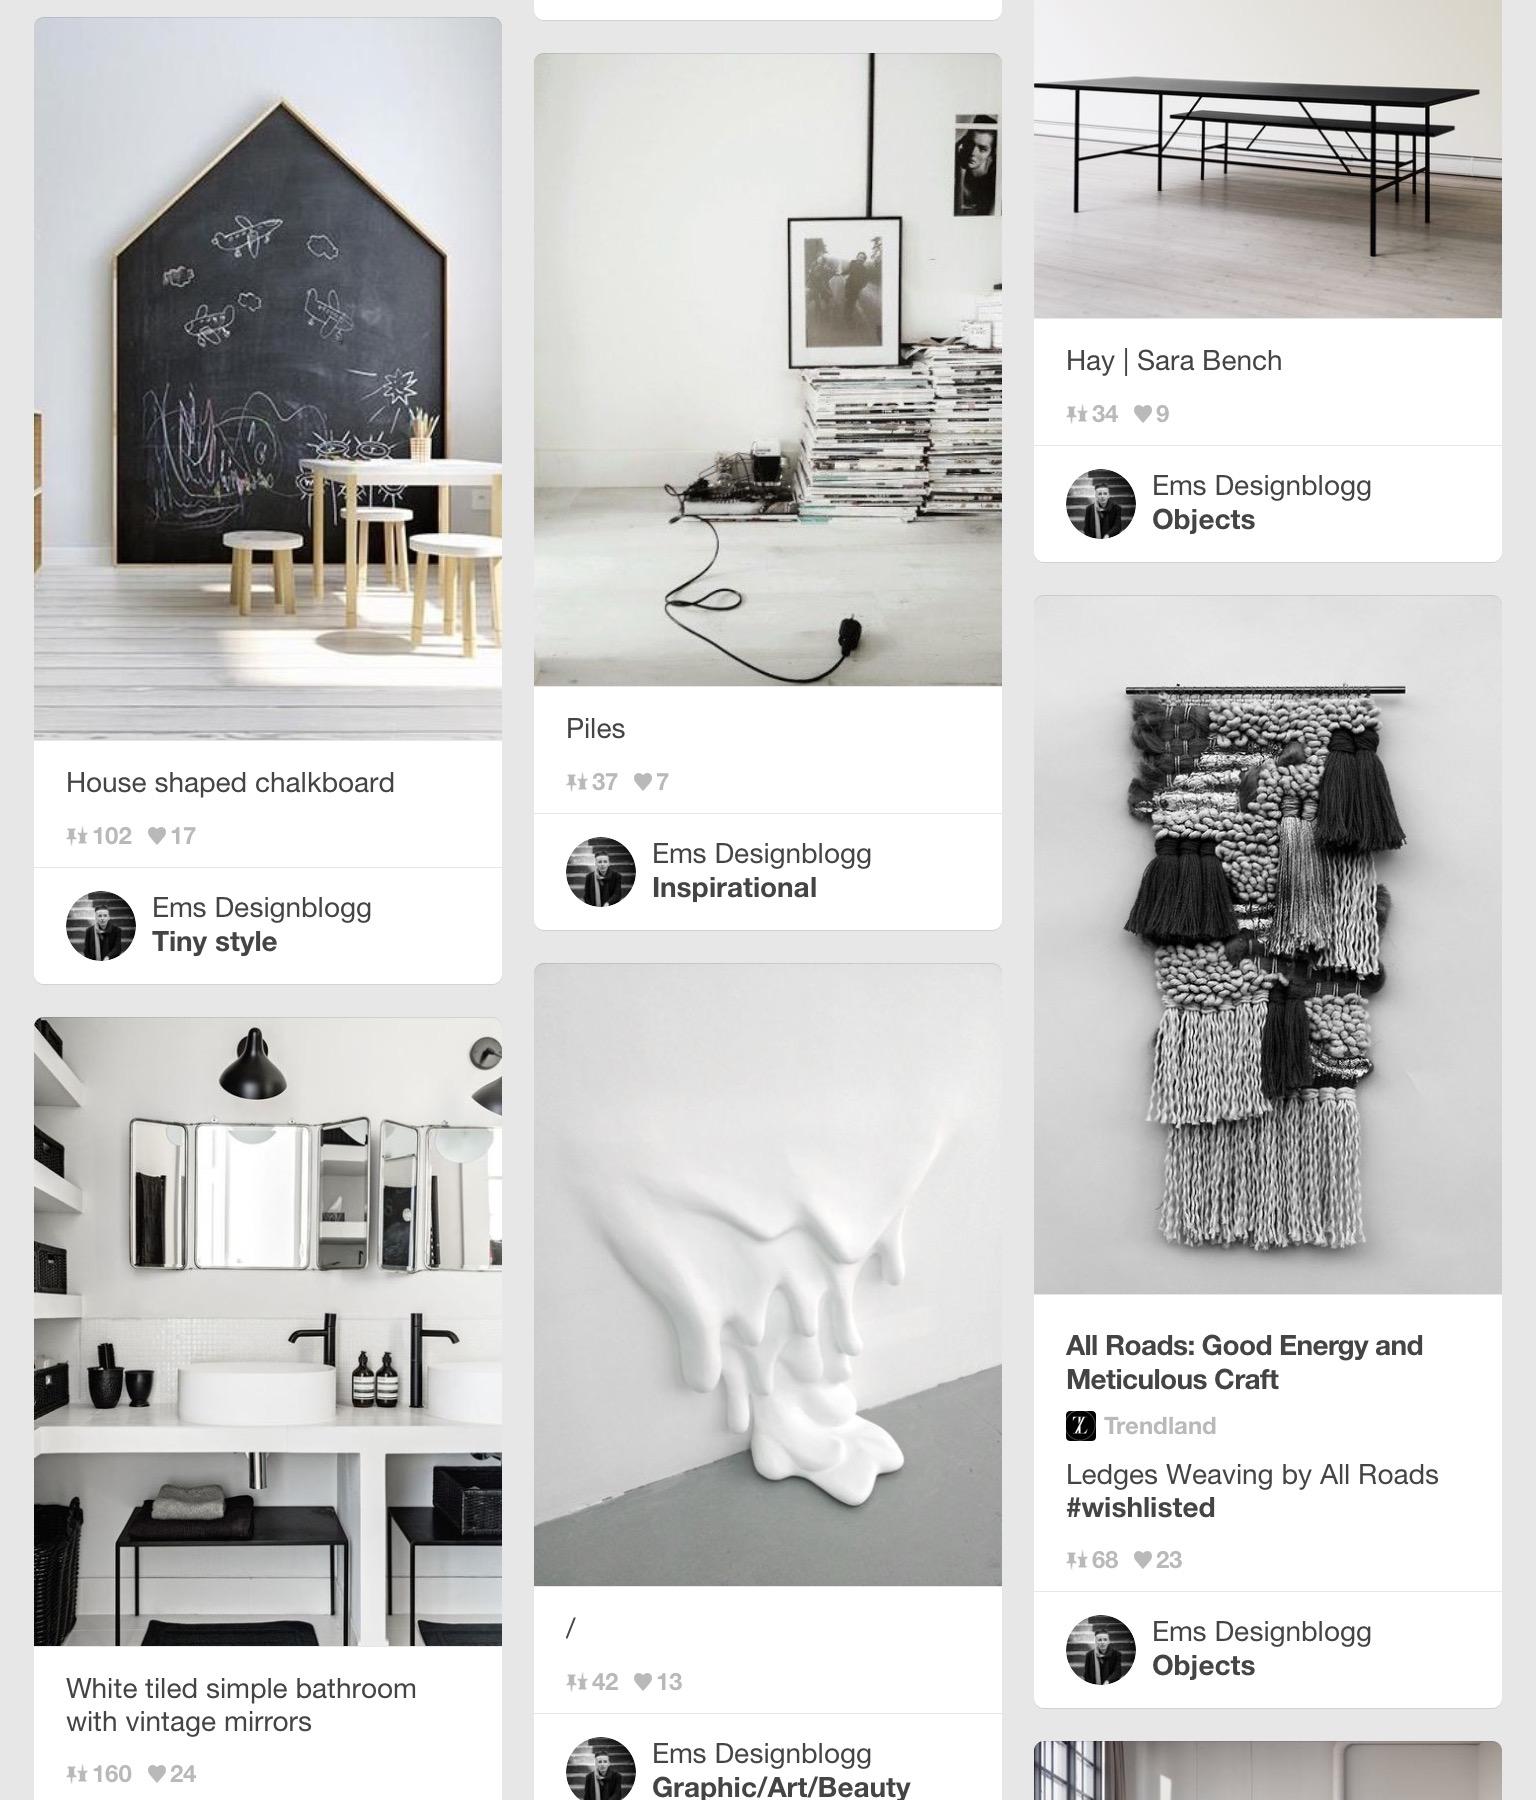 Ems_Designblogg_Pinterest